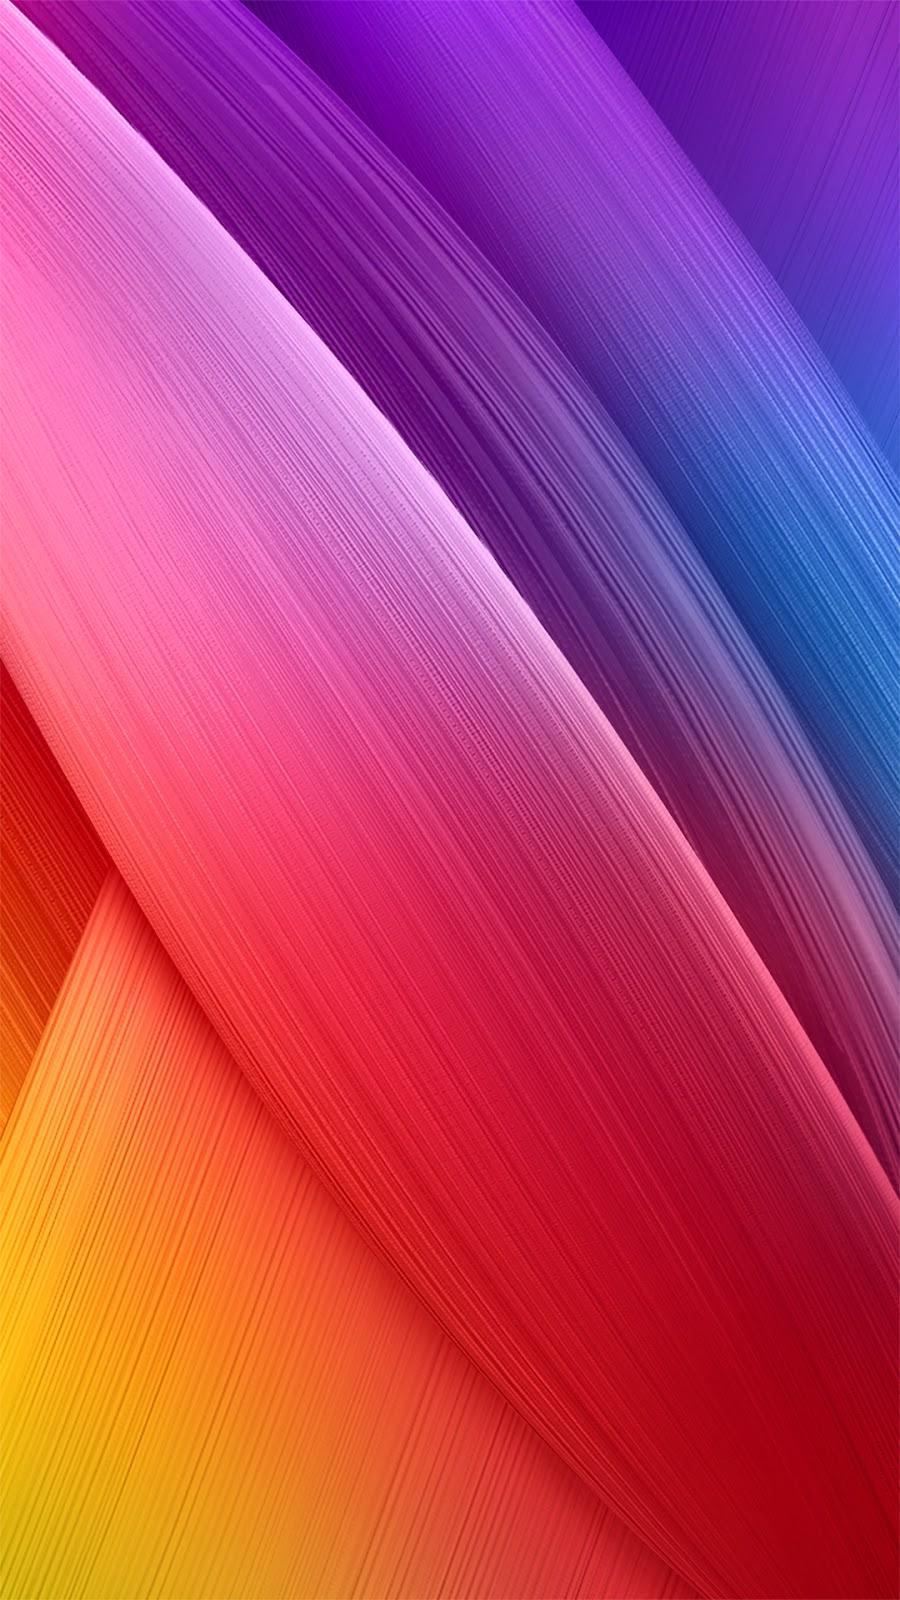 49 ] Asus Zenfone 2 Wallpaper On WallpaperSafari